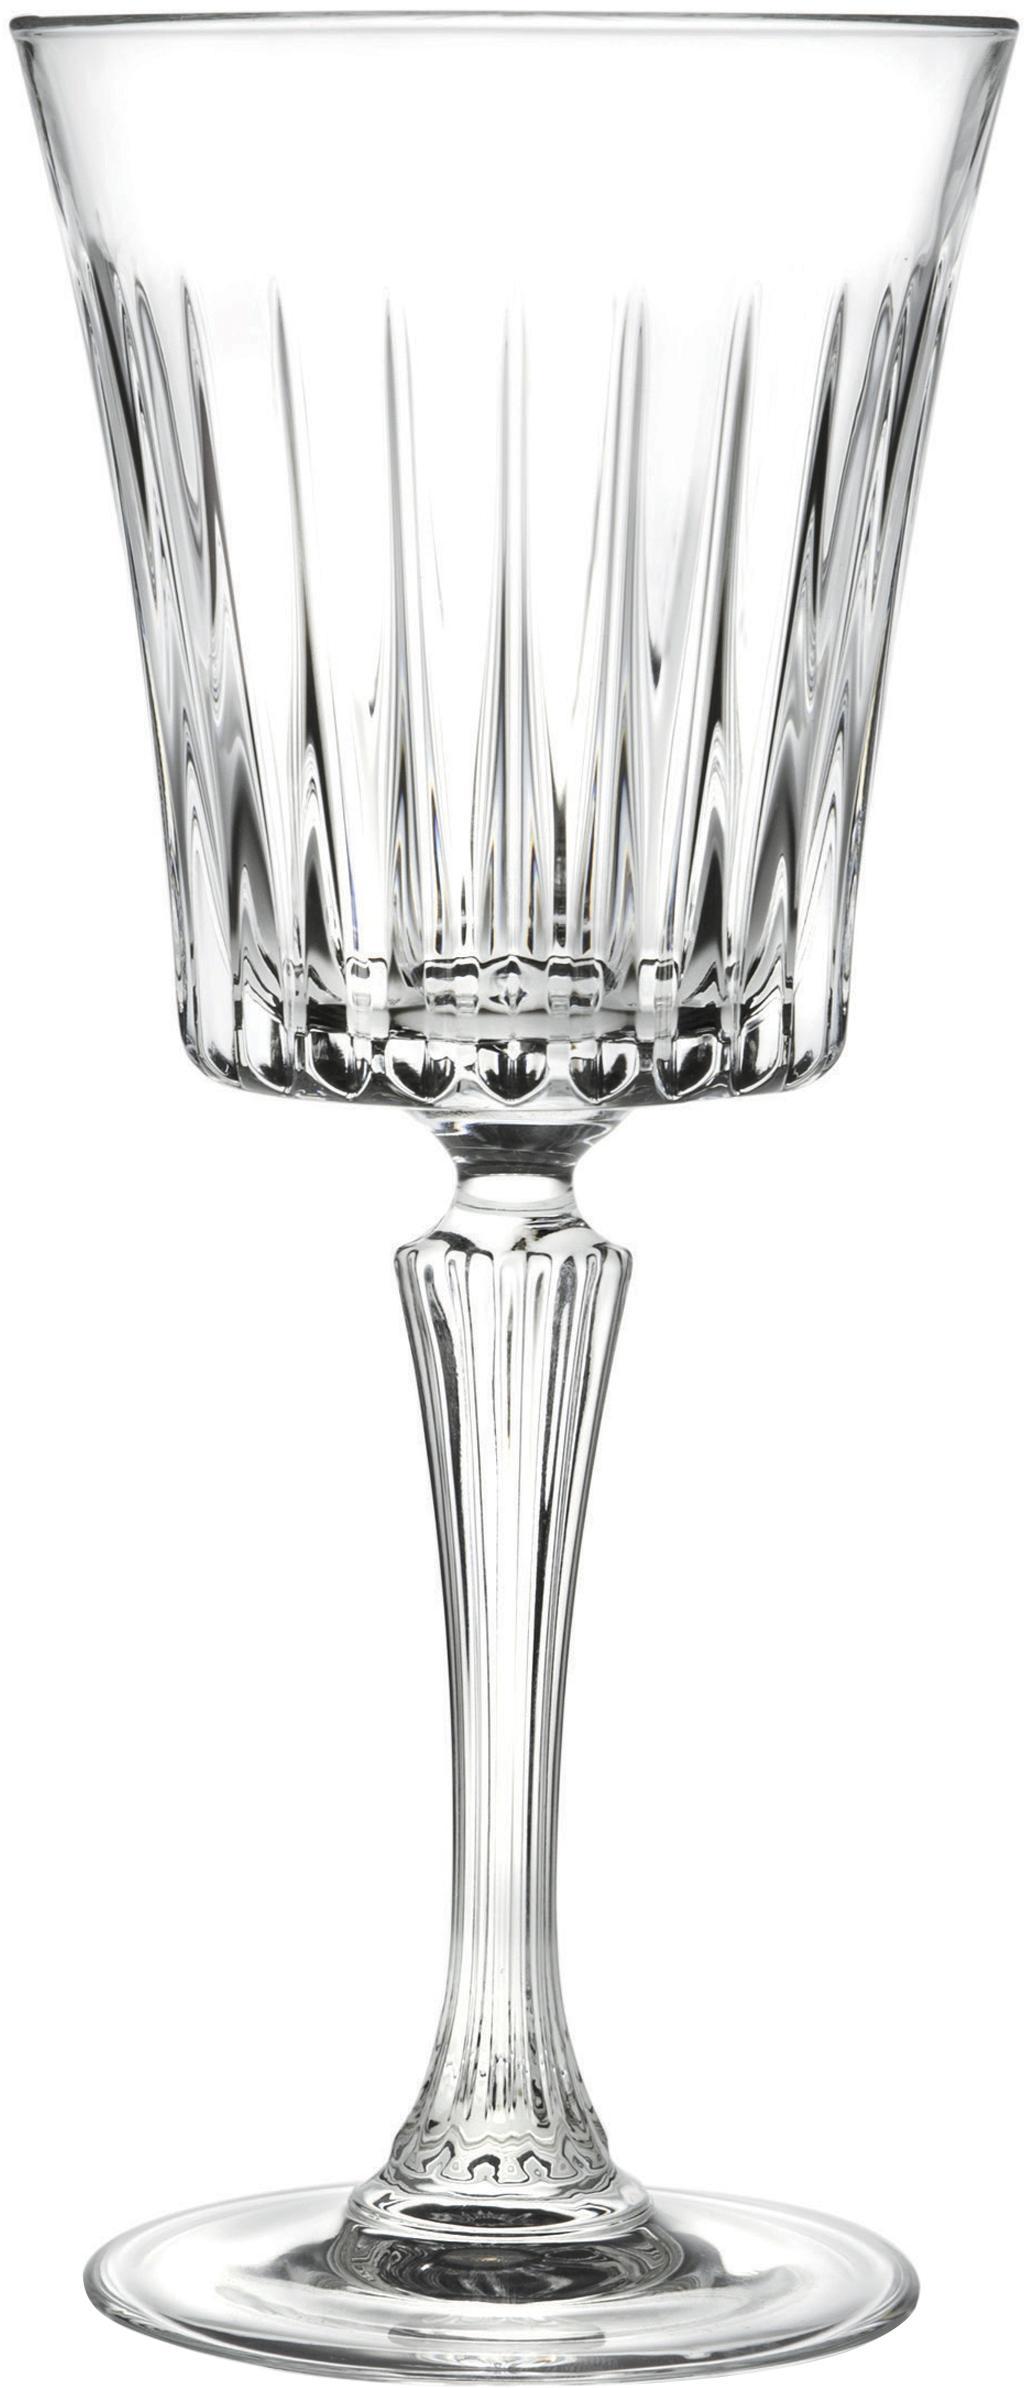 Kristallen witte wijnglazen Timeless, 6 stuks, Kristalglas, Transparant, Ø 8 x H 20 cm